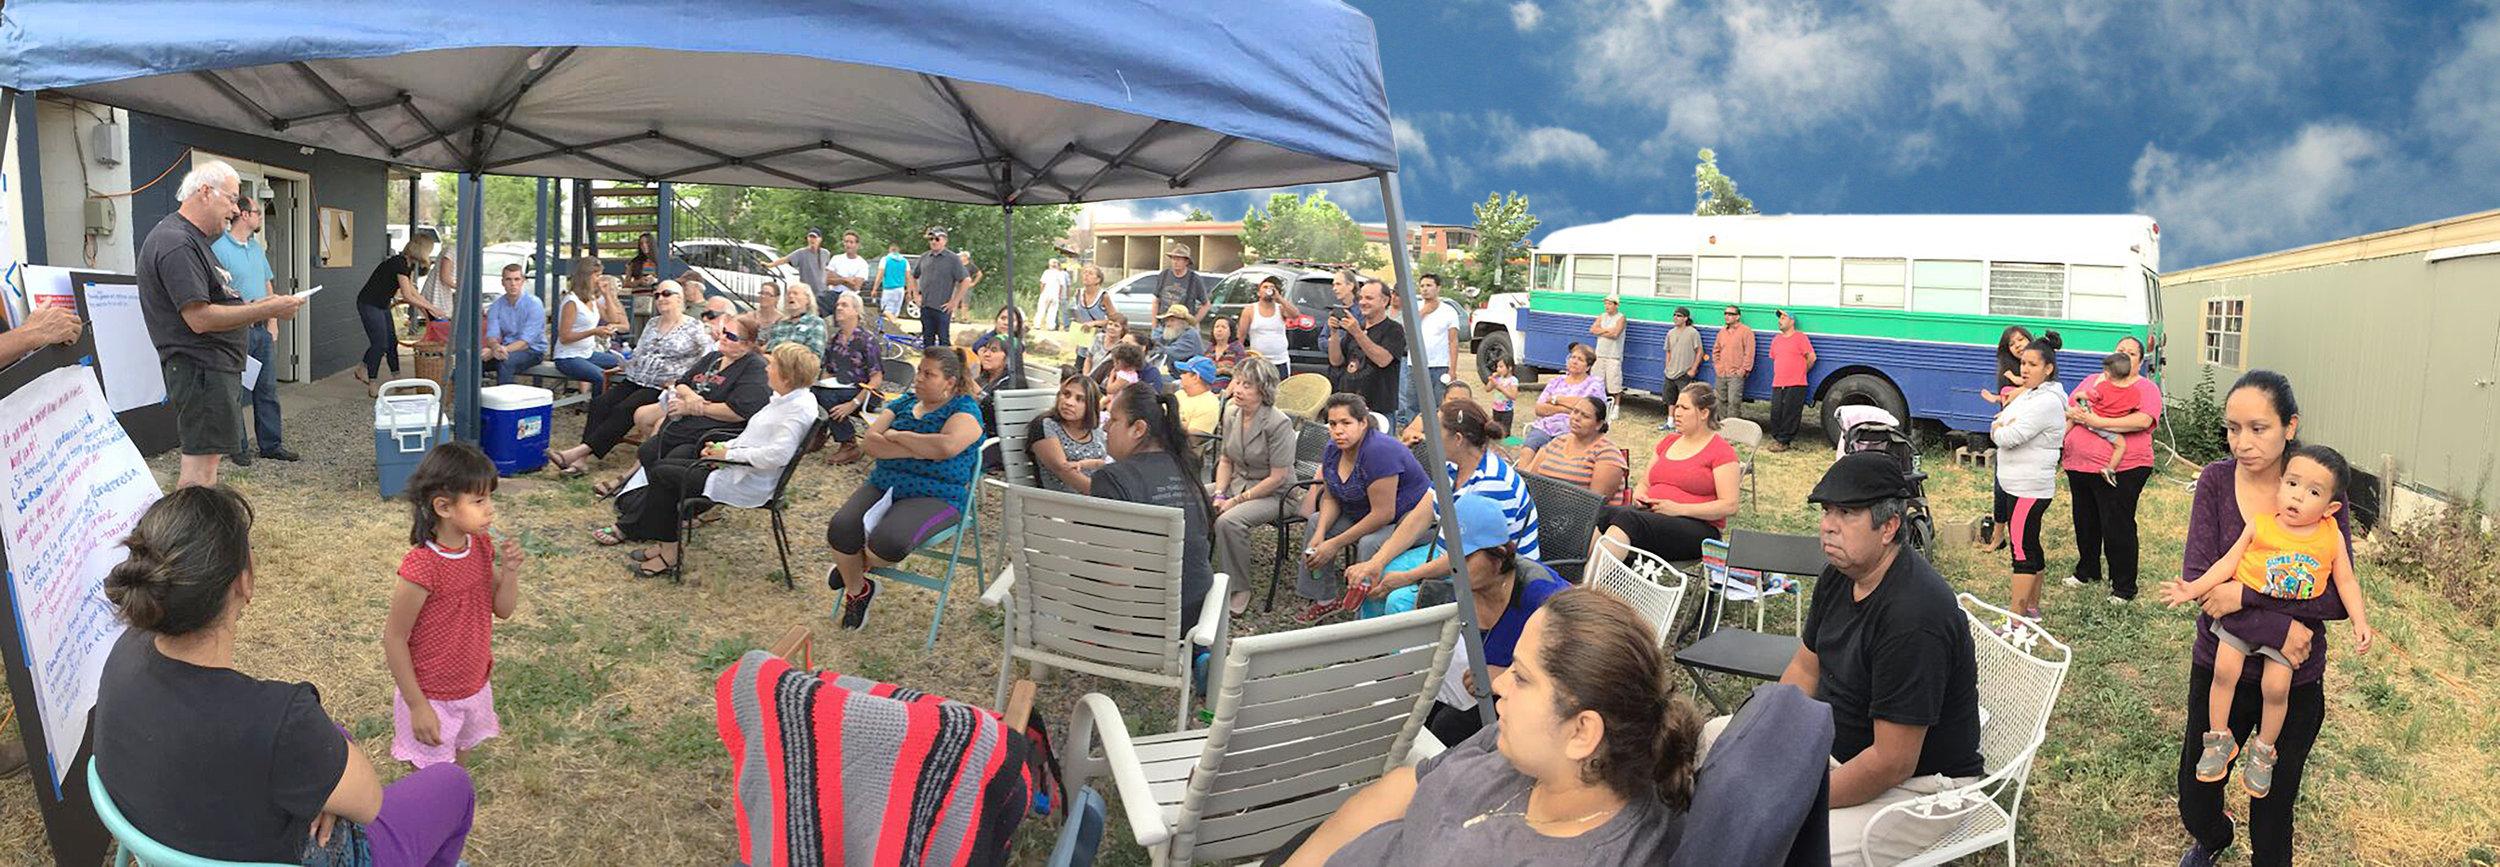 Ponderosa Mobile Home Park Community Meeting.jpg